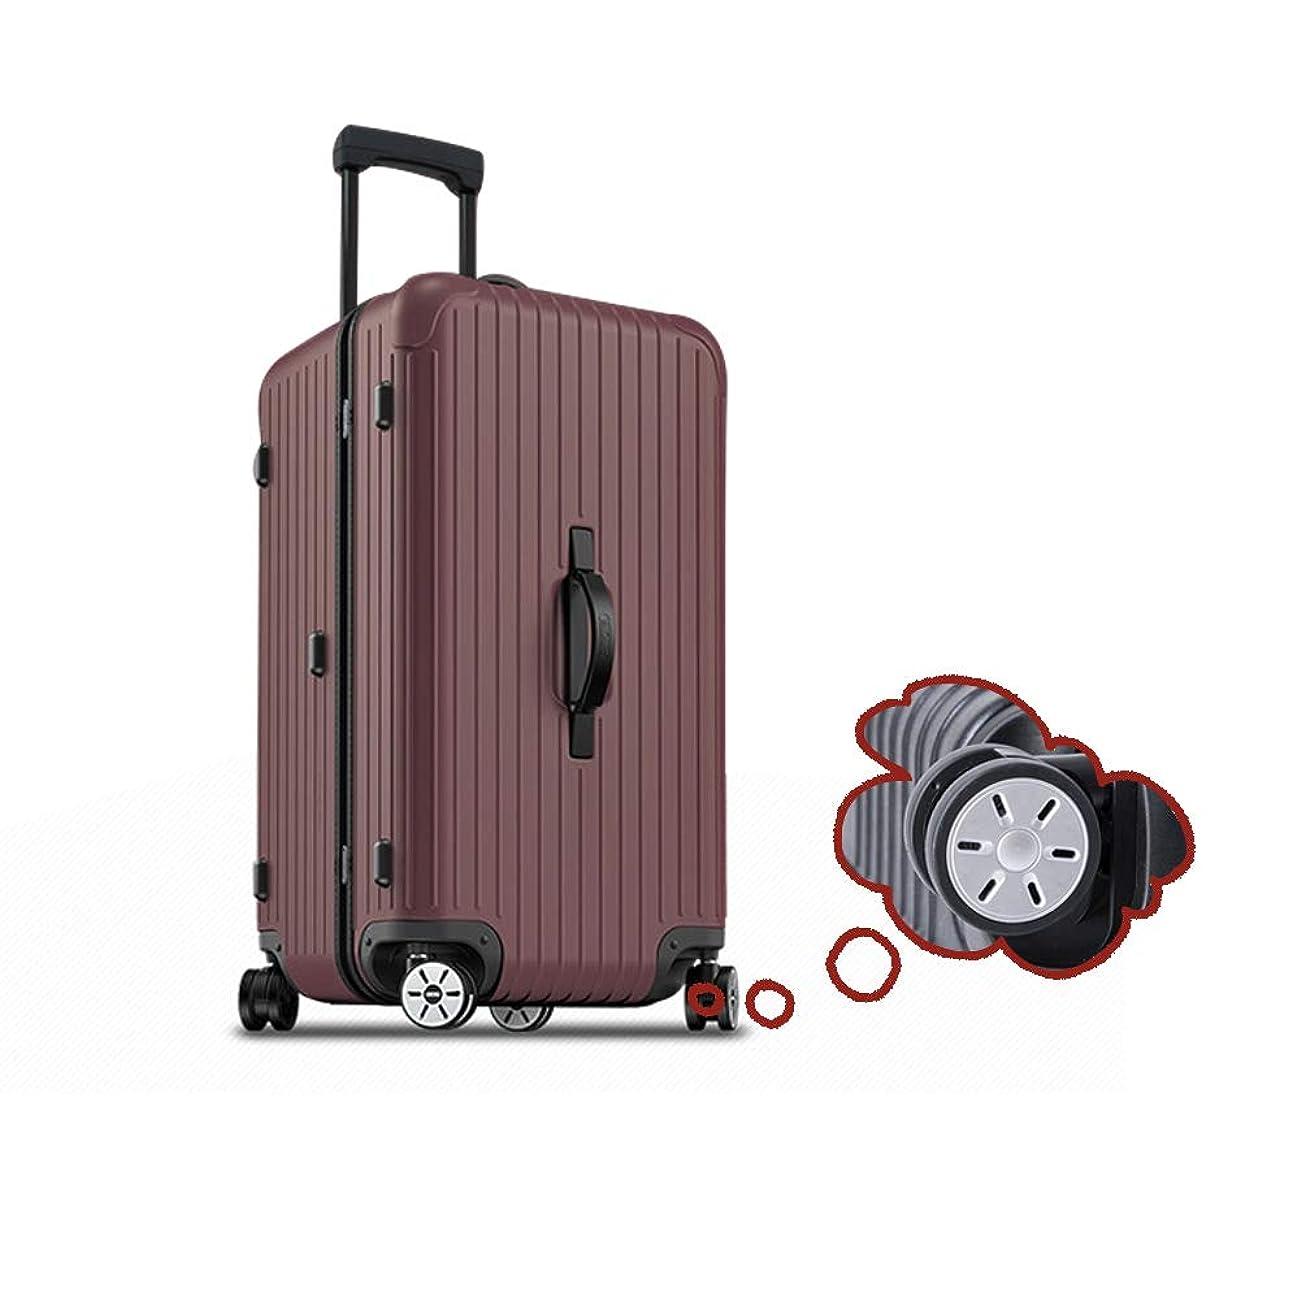 IPO スーツケース キャリーケース トランク ドイツPC TSAロック 大容量 超軽量 旅行 出張 ビジネス OL 静音 防水 360度ユニバーサルホイール 持ち運びやすい正面ハンドル ダブルファスナー式 6種類のサイズ 4色展開